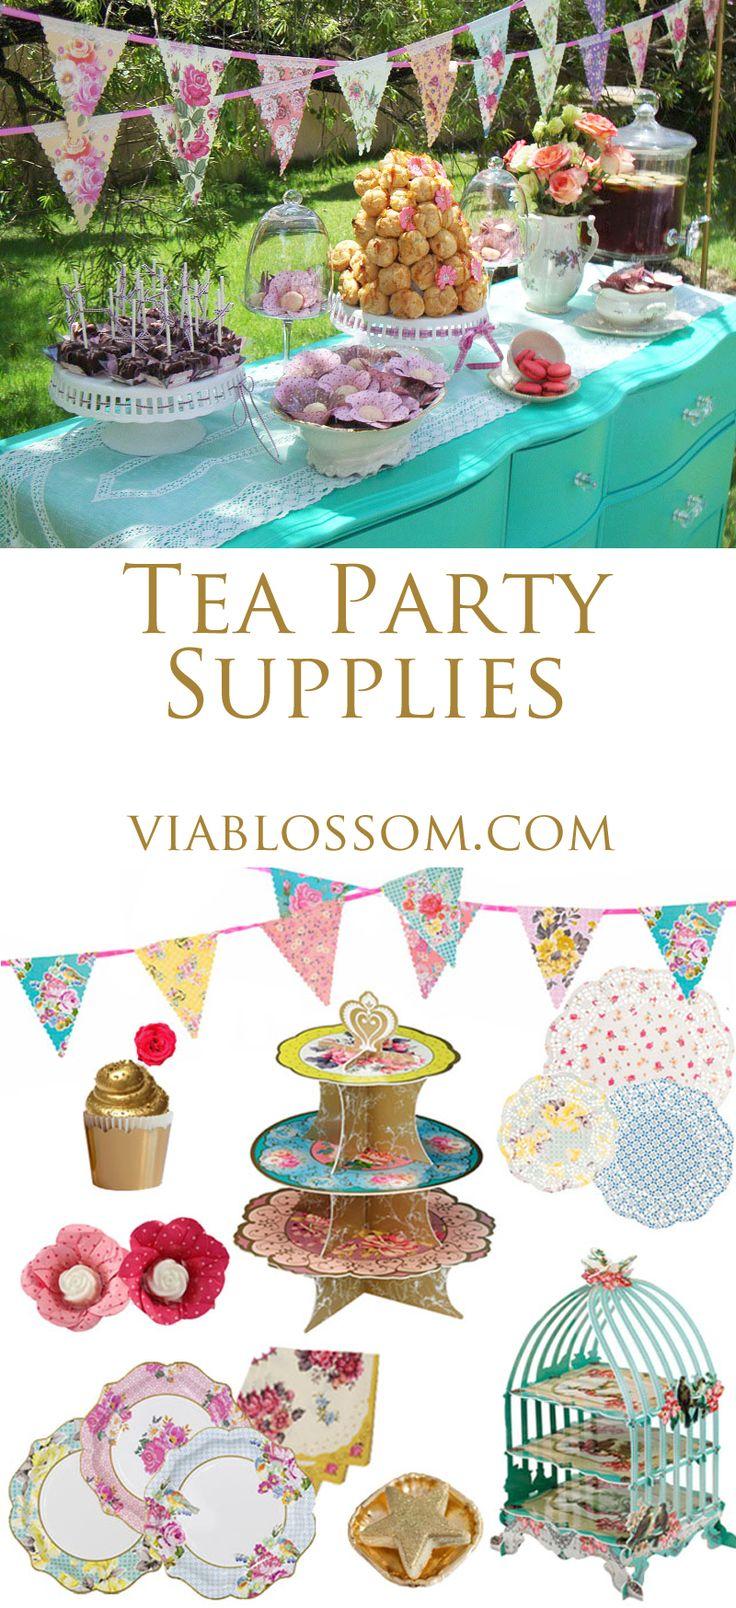 294 best Party: High Tea images on Pinterest